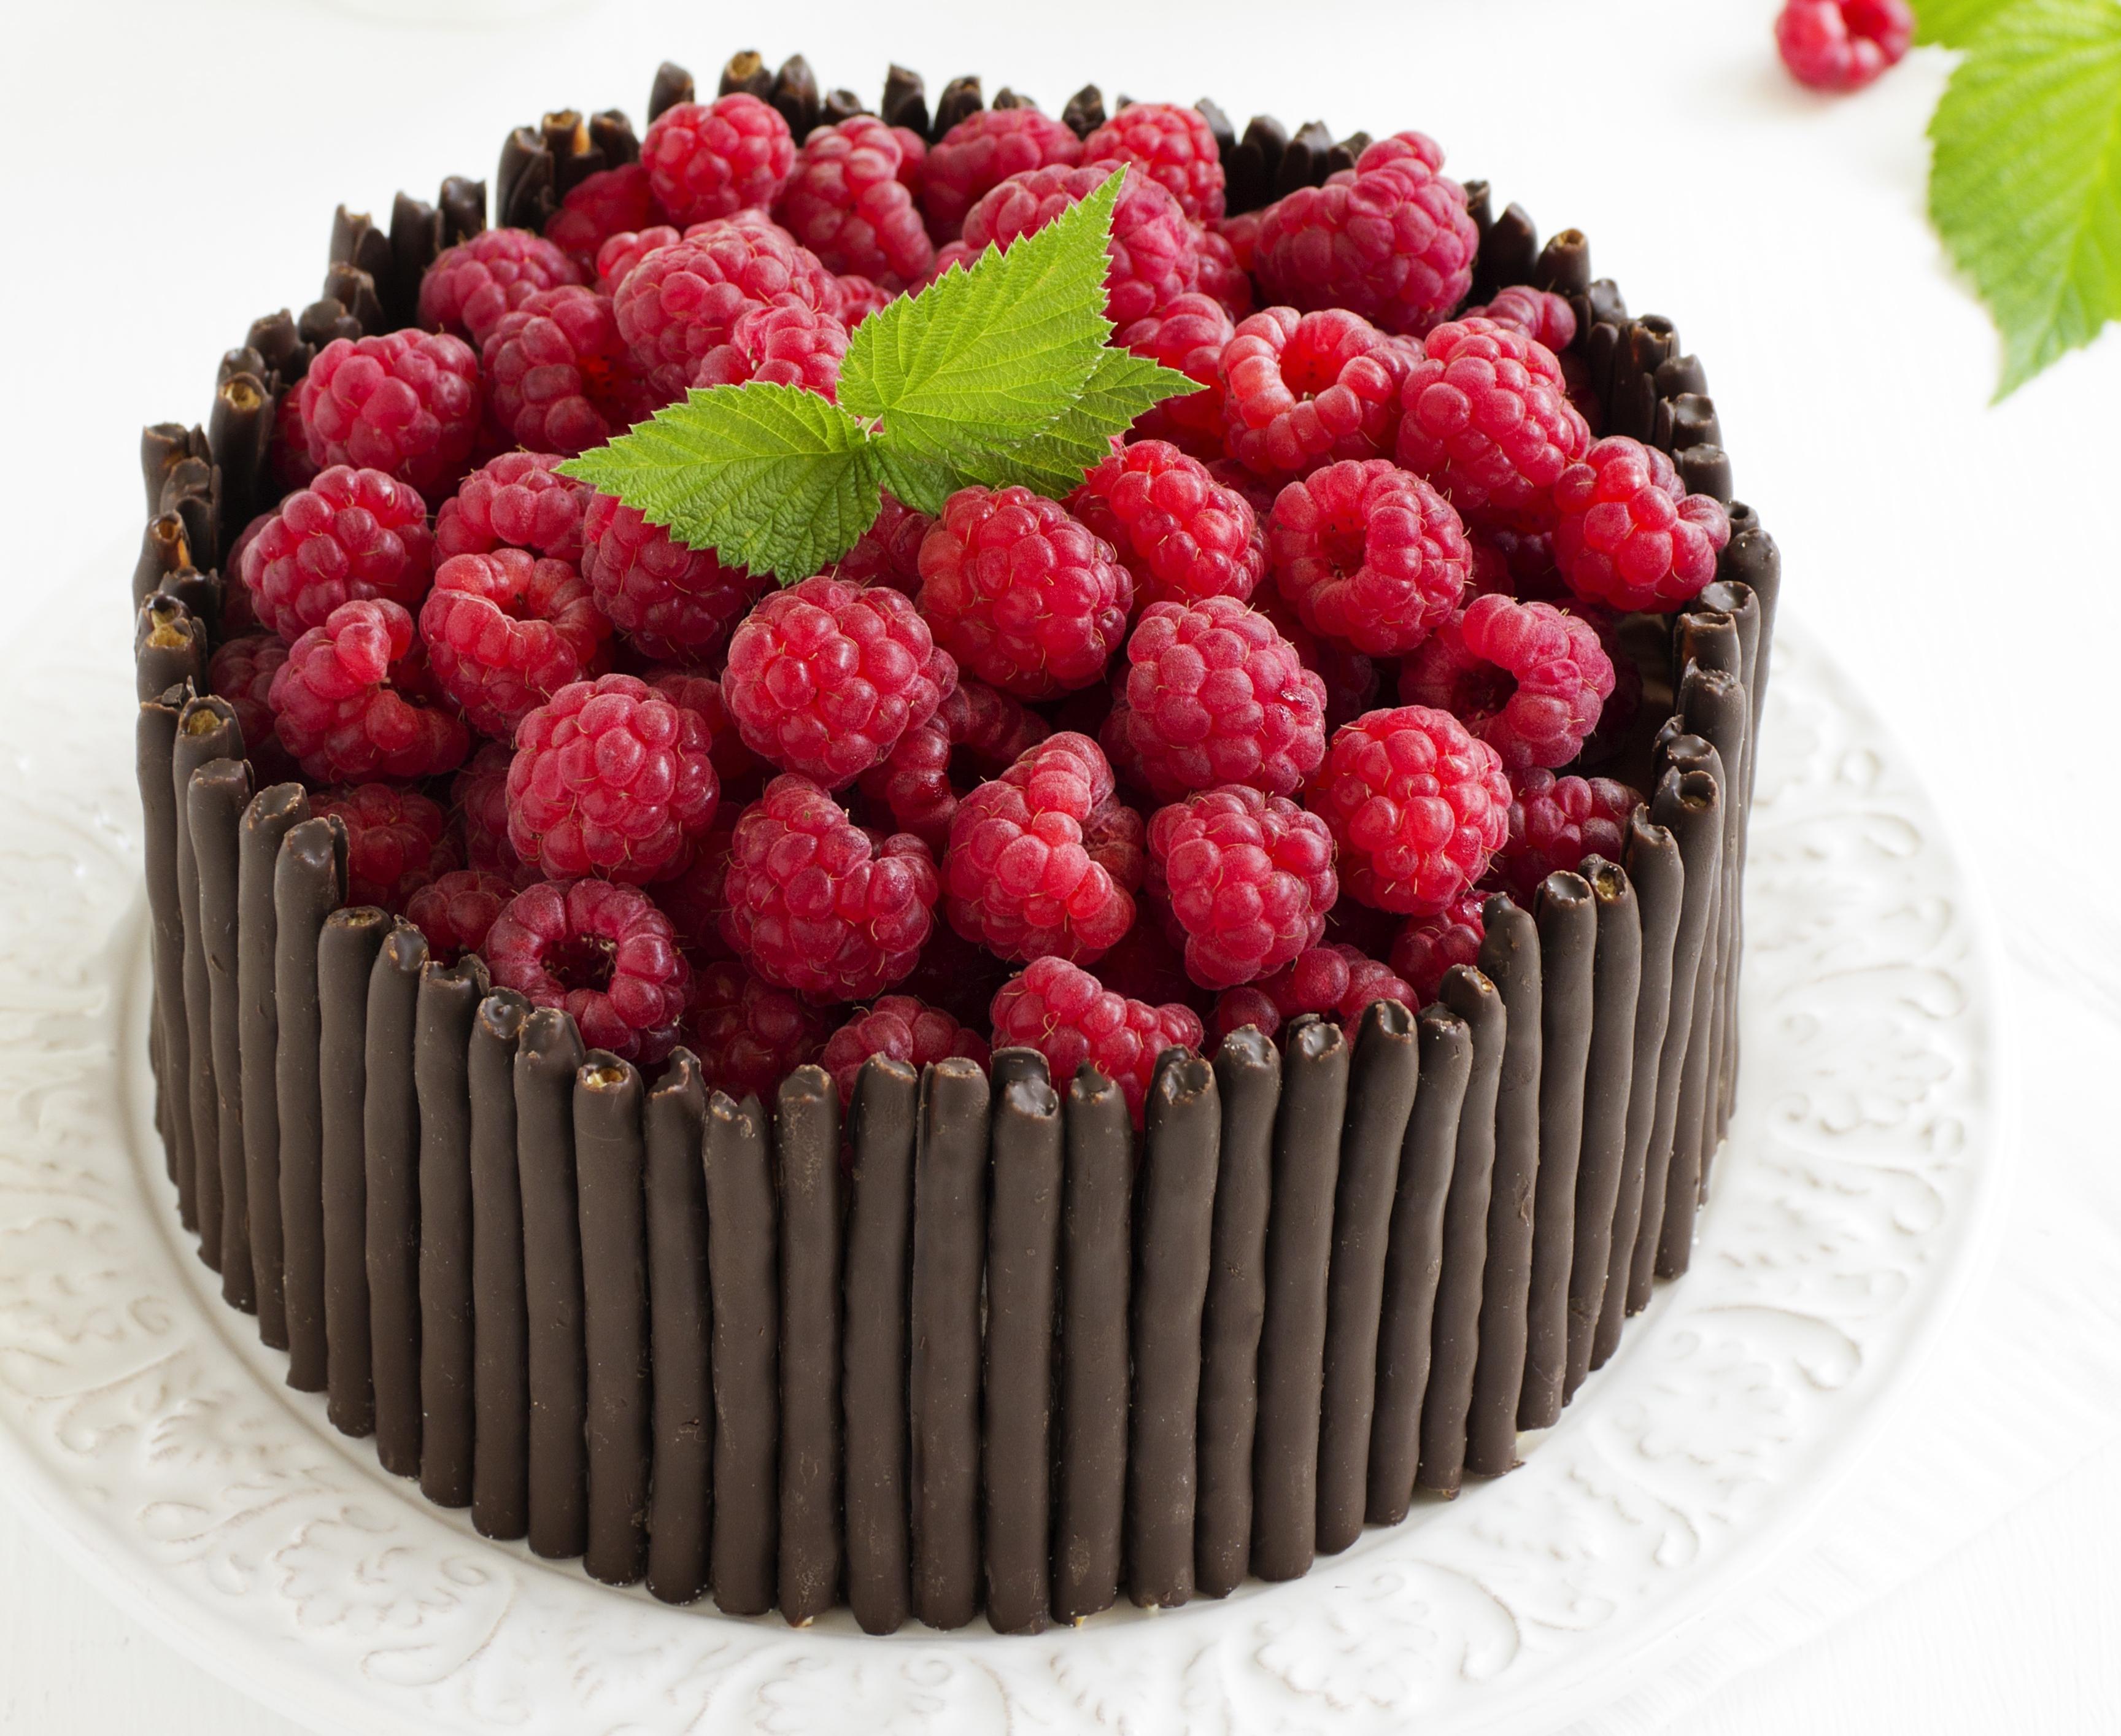 Обои Шоколад Торты Малина Пища 3456x2829 Еда Продукты питания